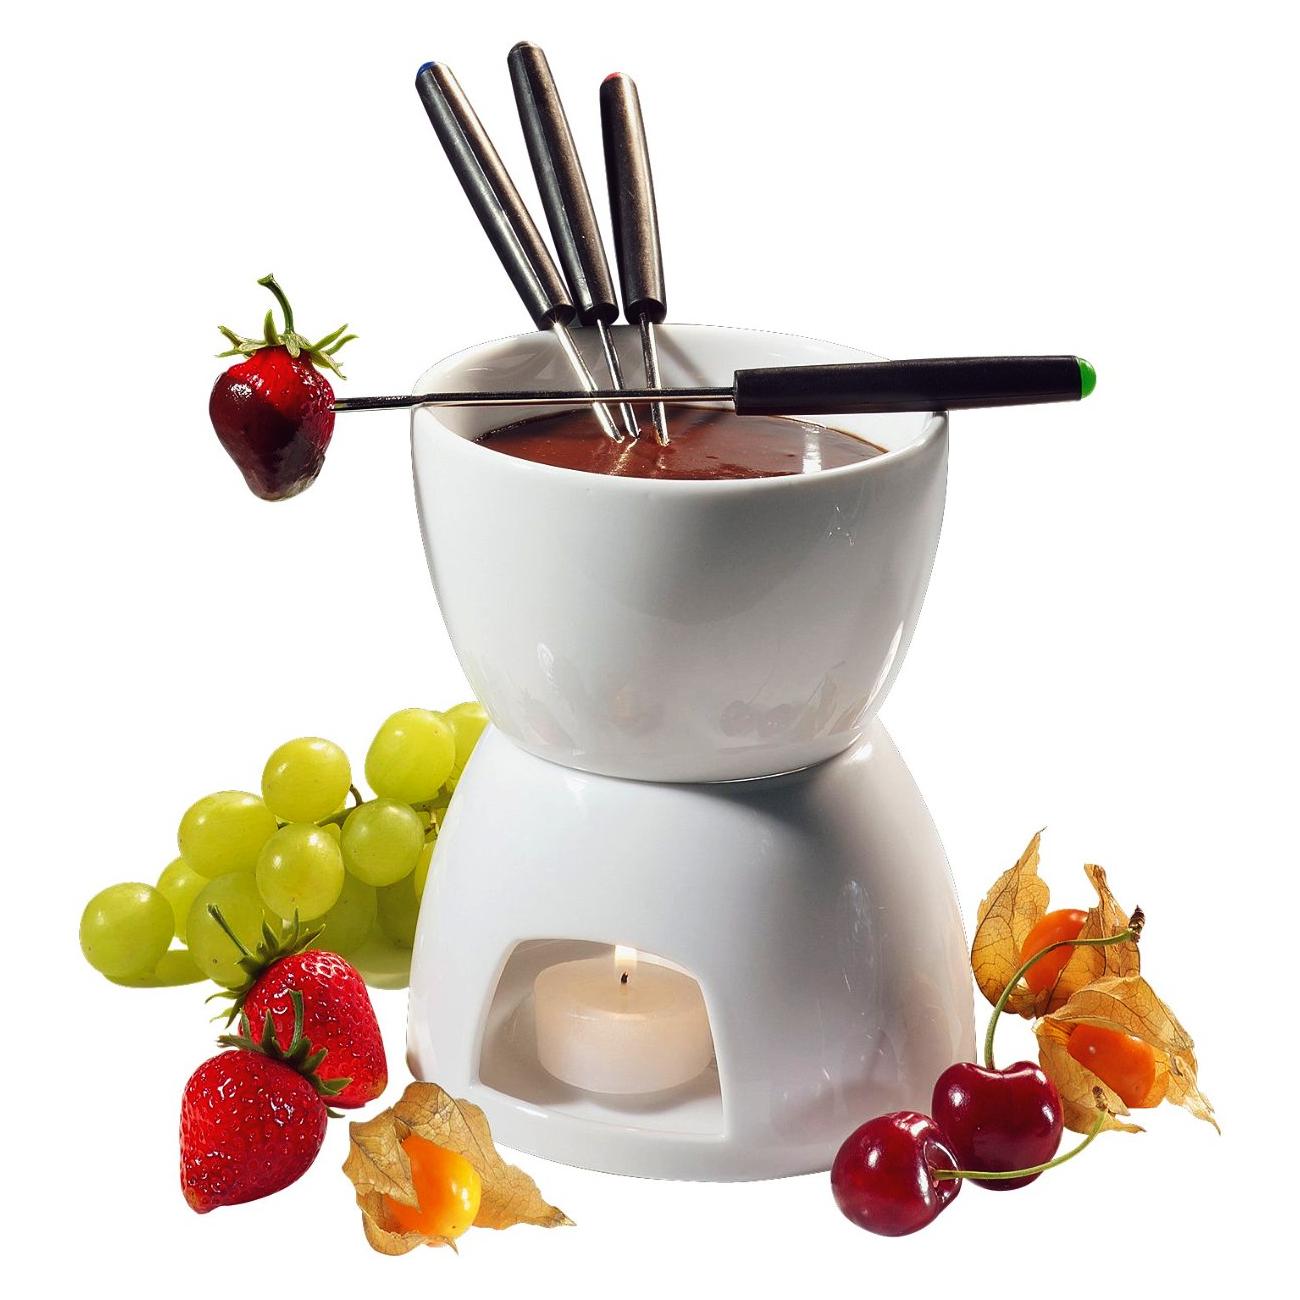 Frieling White Porcelain 2 Cup Chocolate Fondue Pot